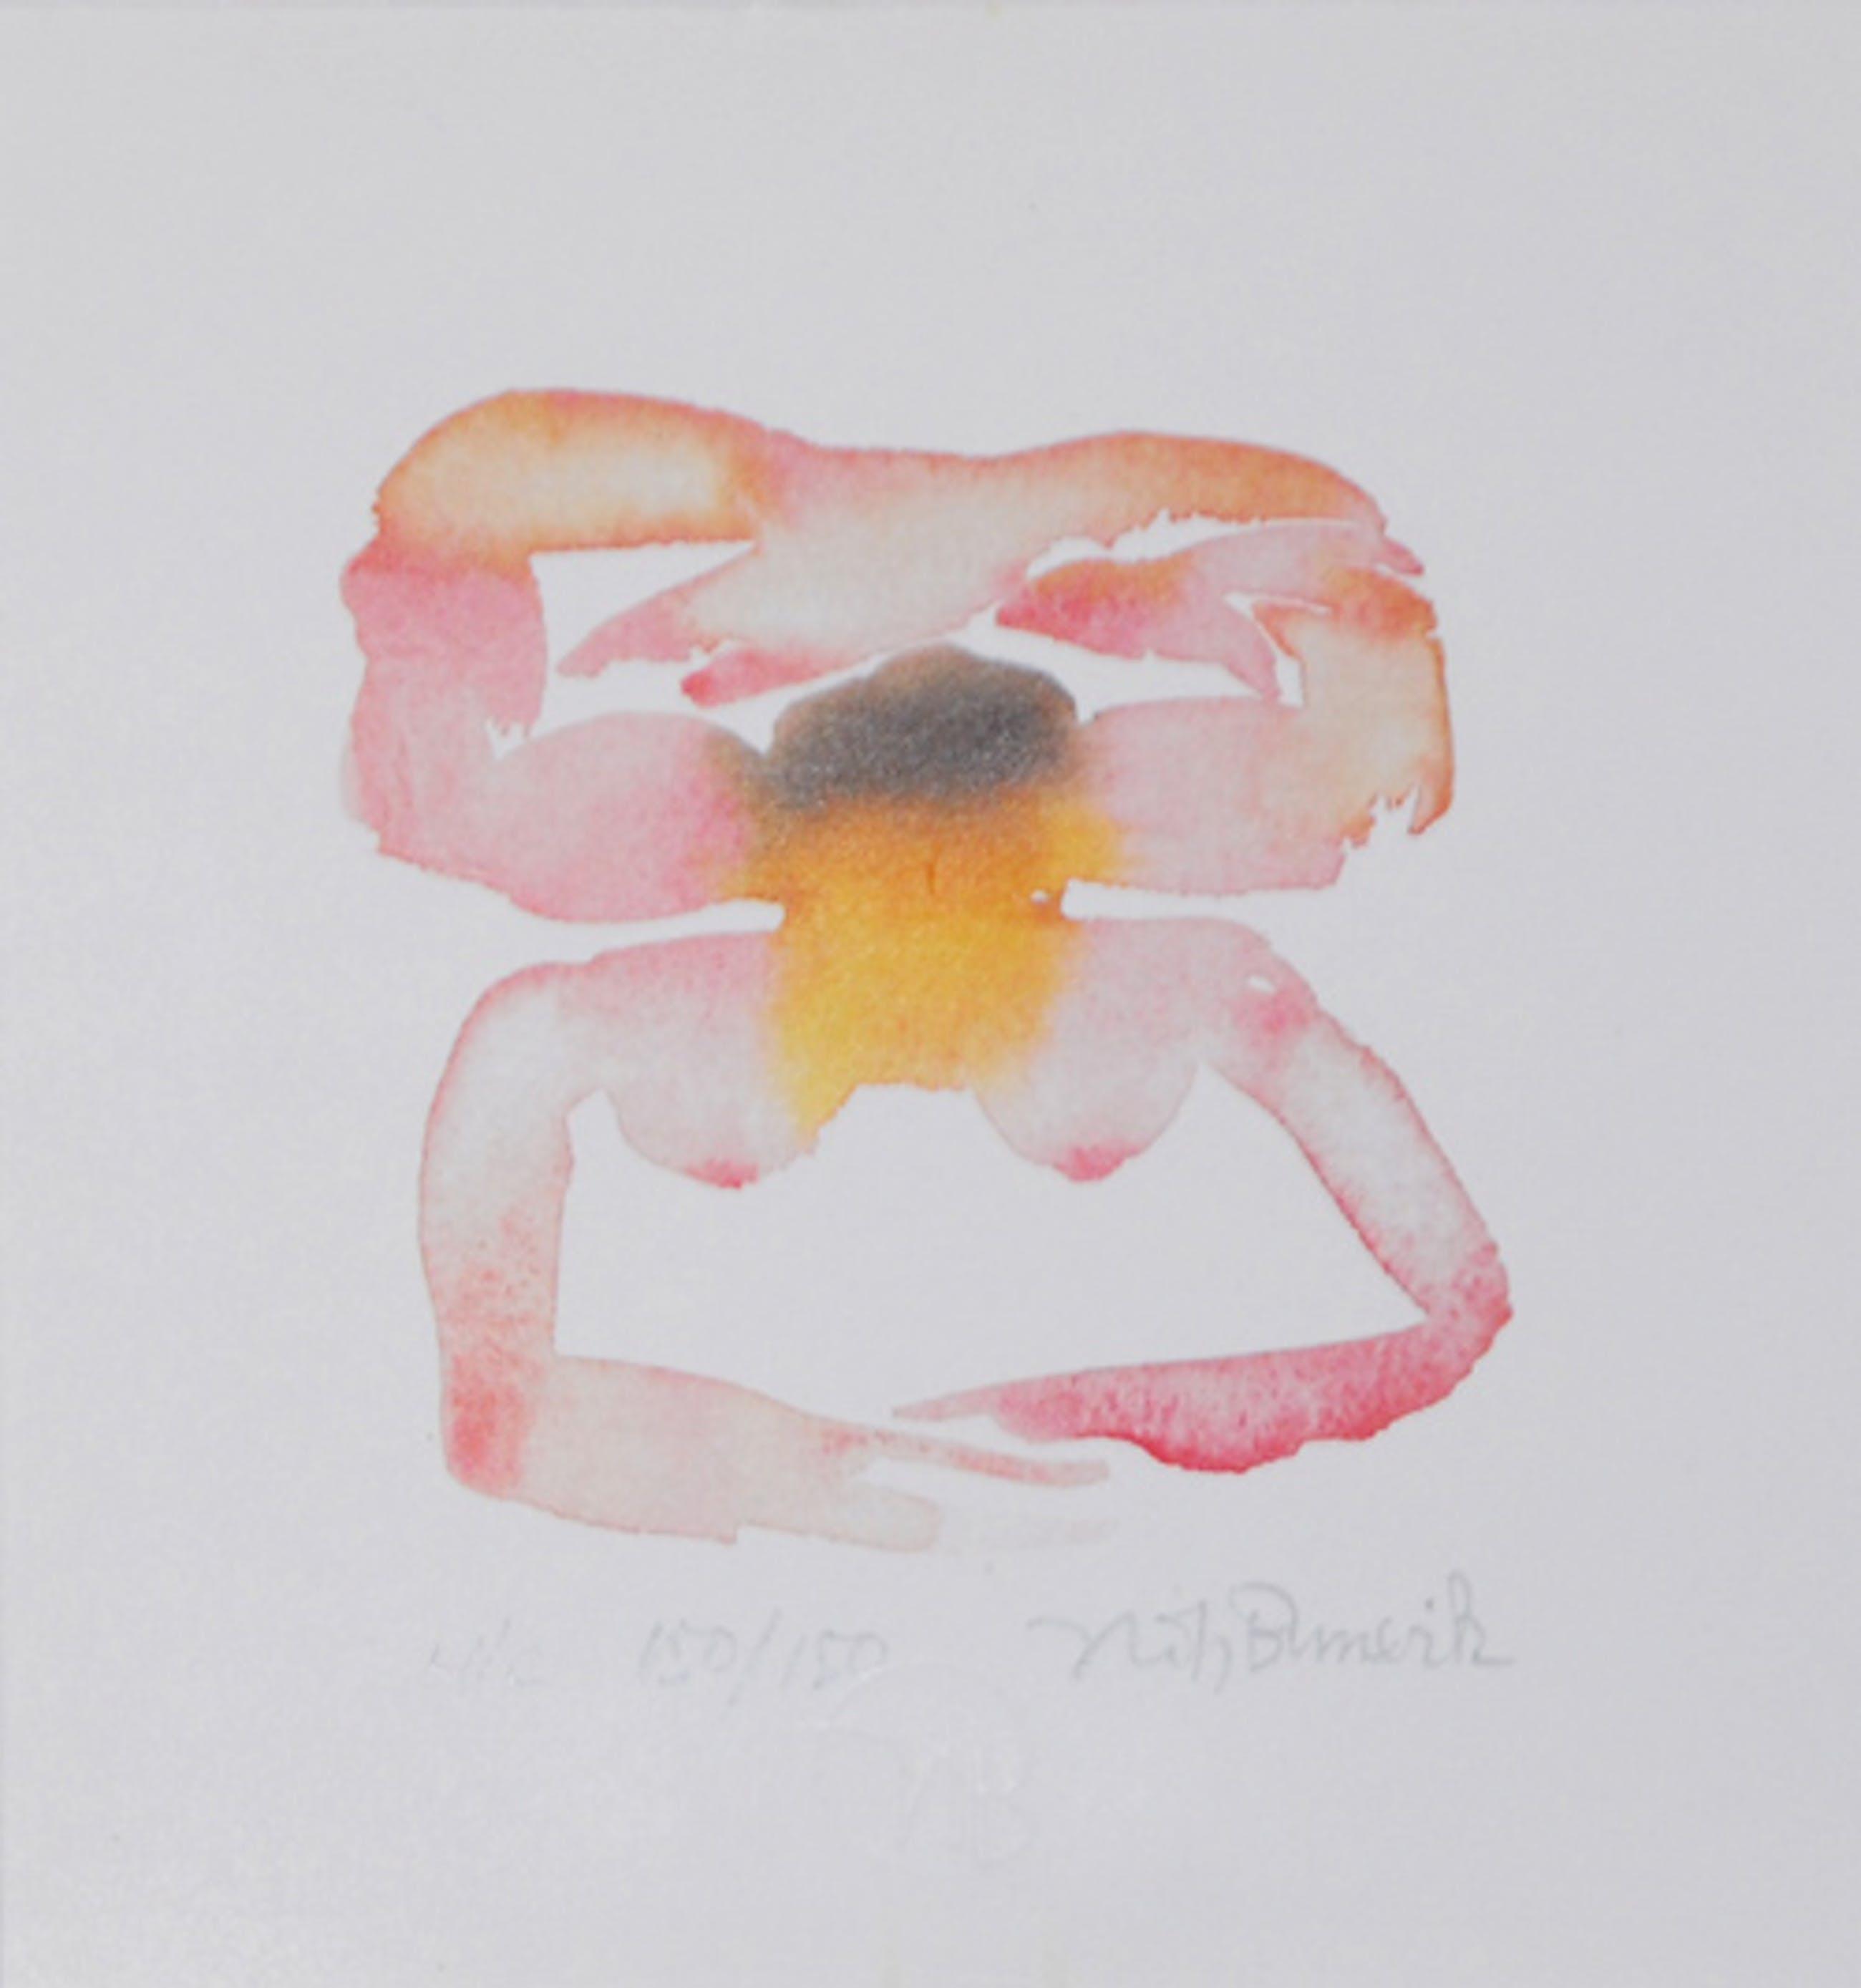 Jorg Reme - e.a: zes zeefdrukken: Molen, Vlag, Tulpen, Man, Kreeft, Abstract kopen? Bied vanaf 22!